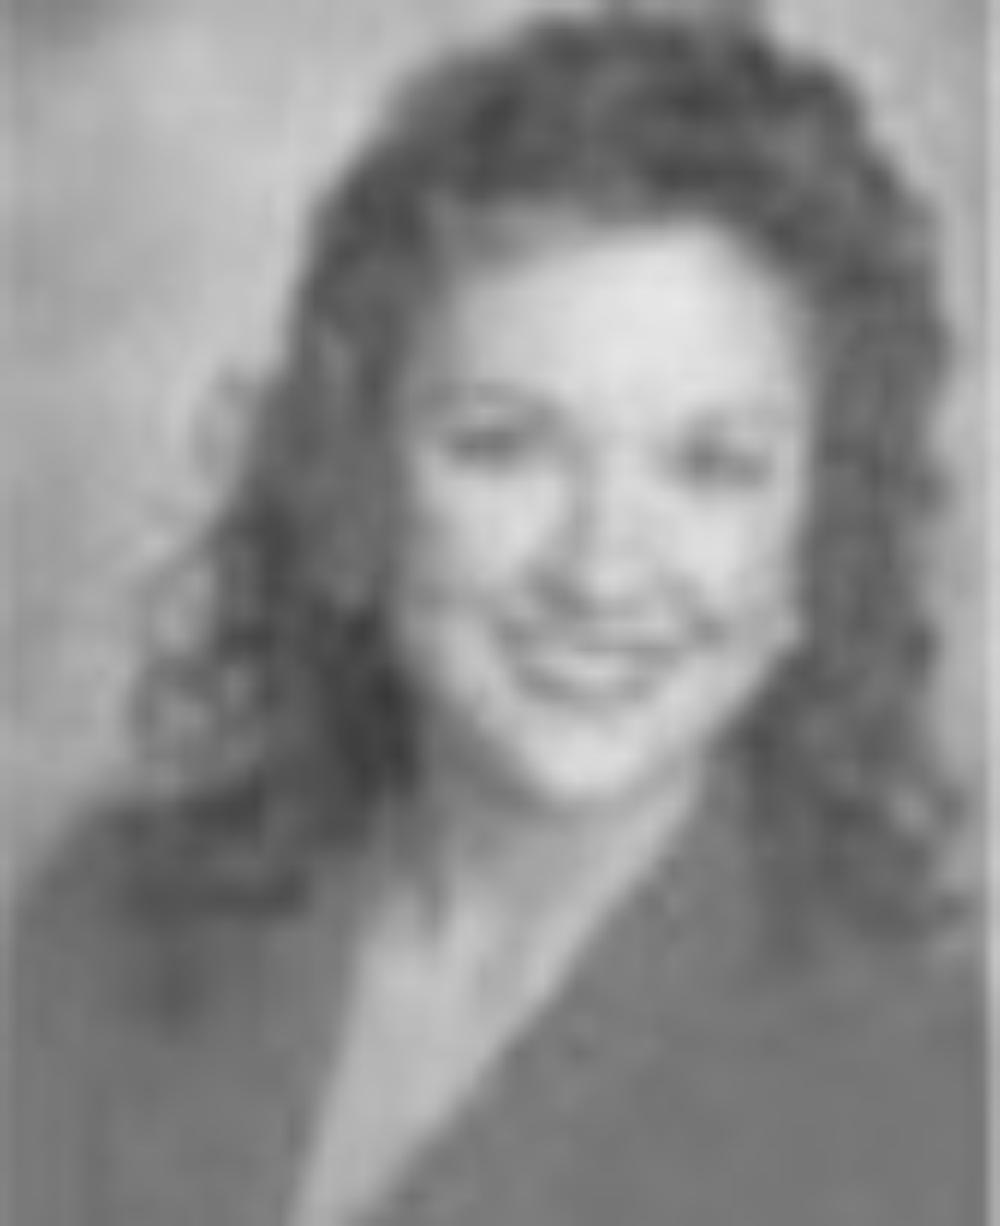 Mellisa Paul  Miss Idaho 1999  Hometown: Boise  Talent: Dramatic Monologue from Steel Magnolias